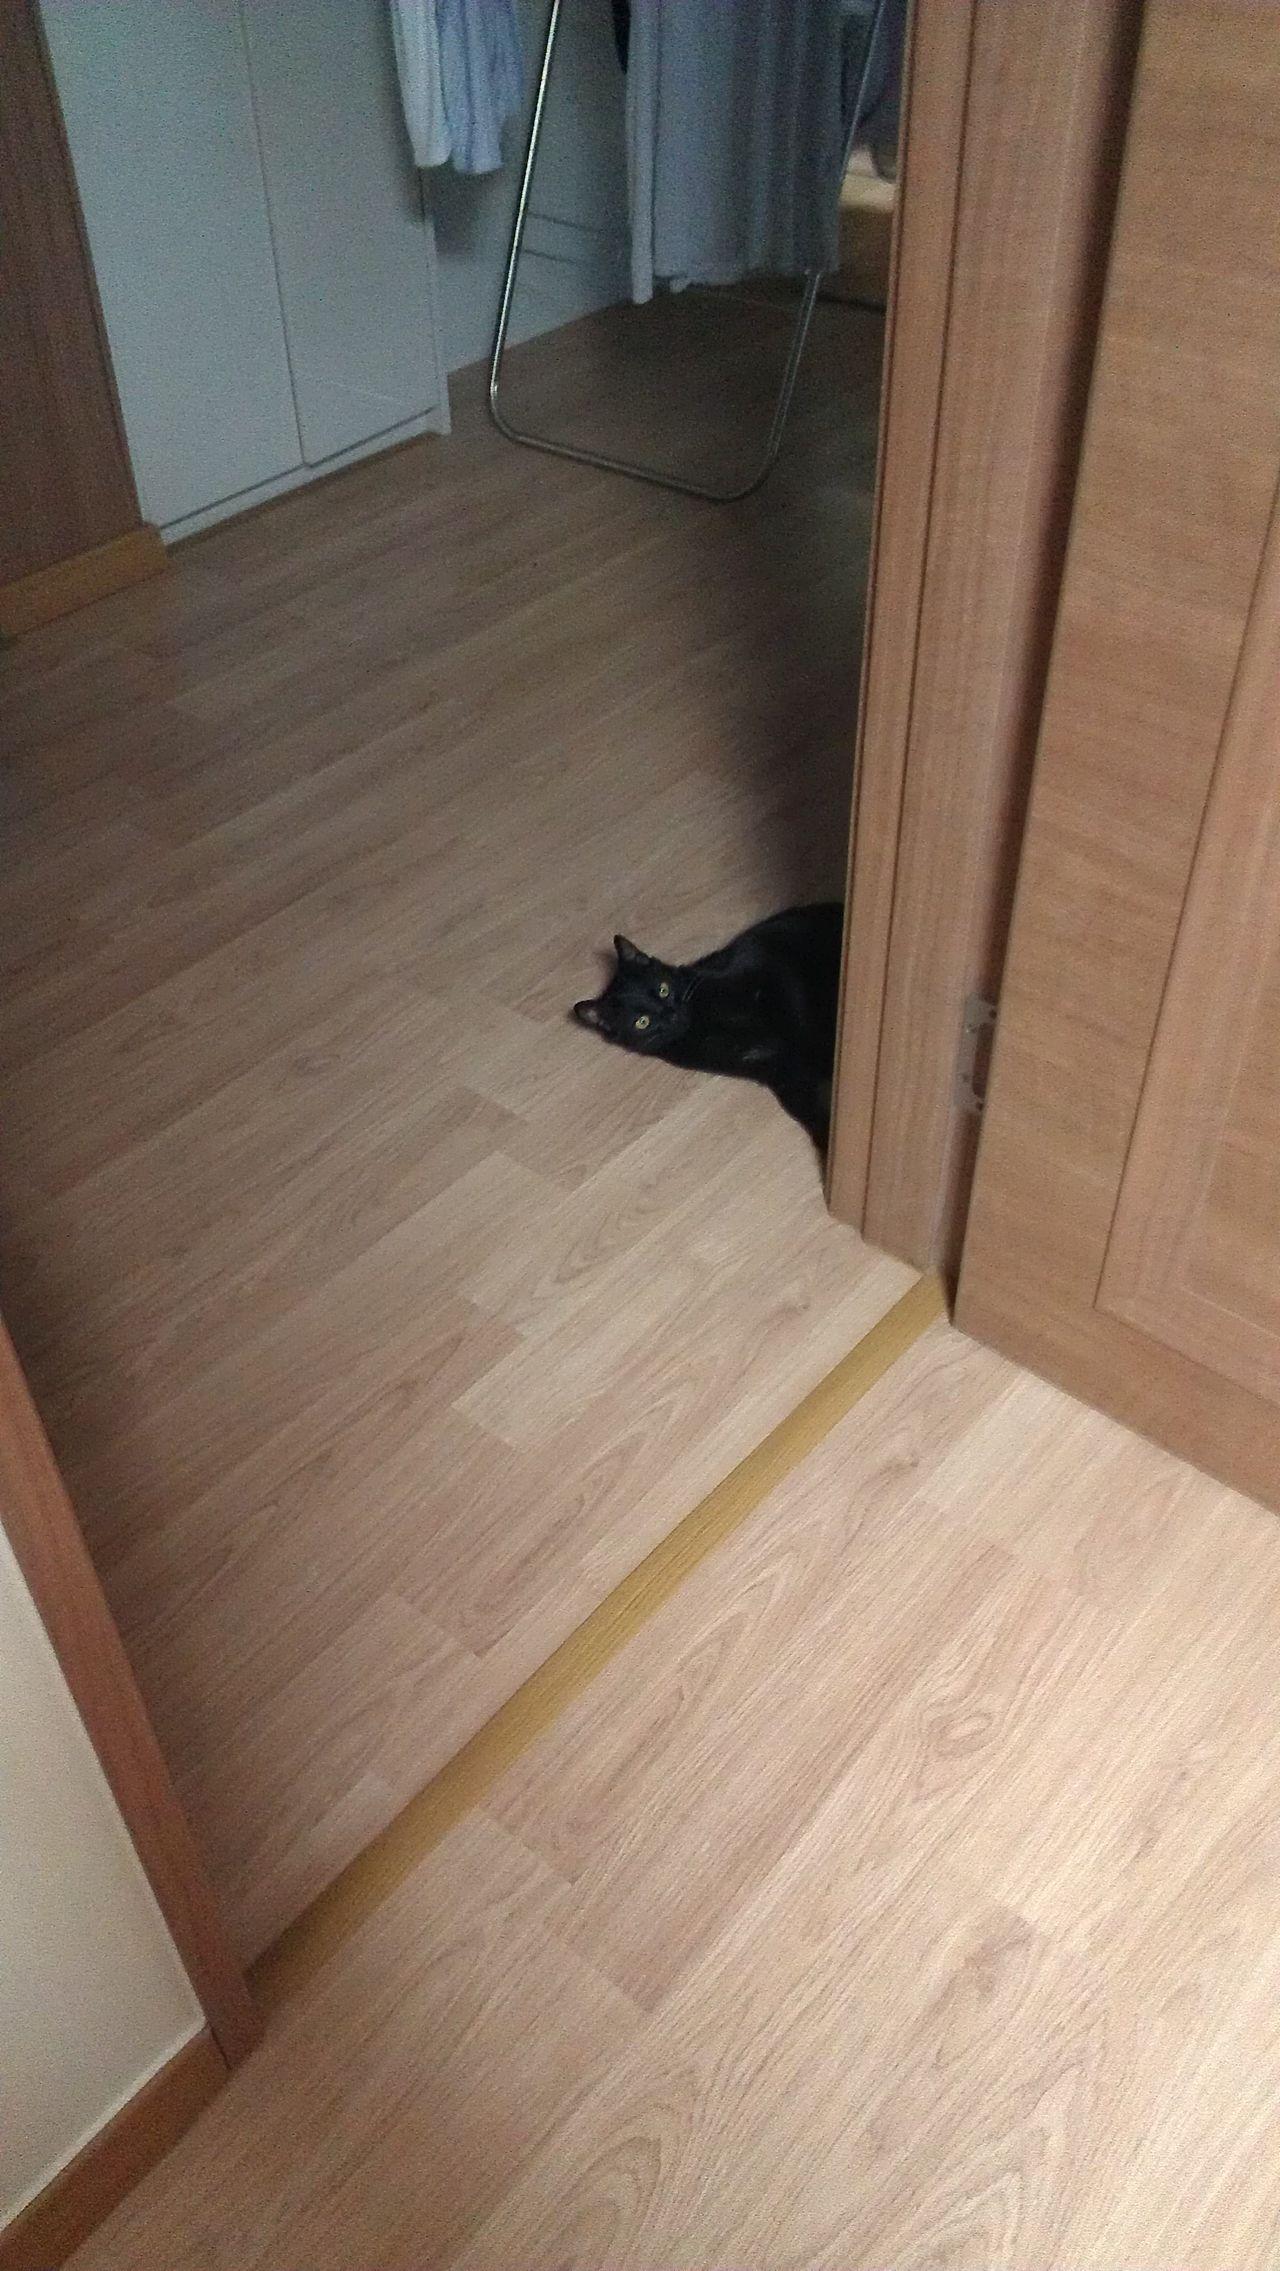 Indoors  Pets Home Interior Domestic Animals Mammal No People Animal Themes Close-up DayNight Cat Cat♡ BLackCat Hello Peekaboo Dawn